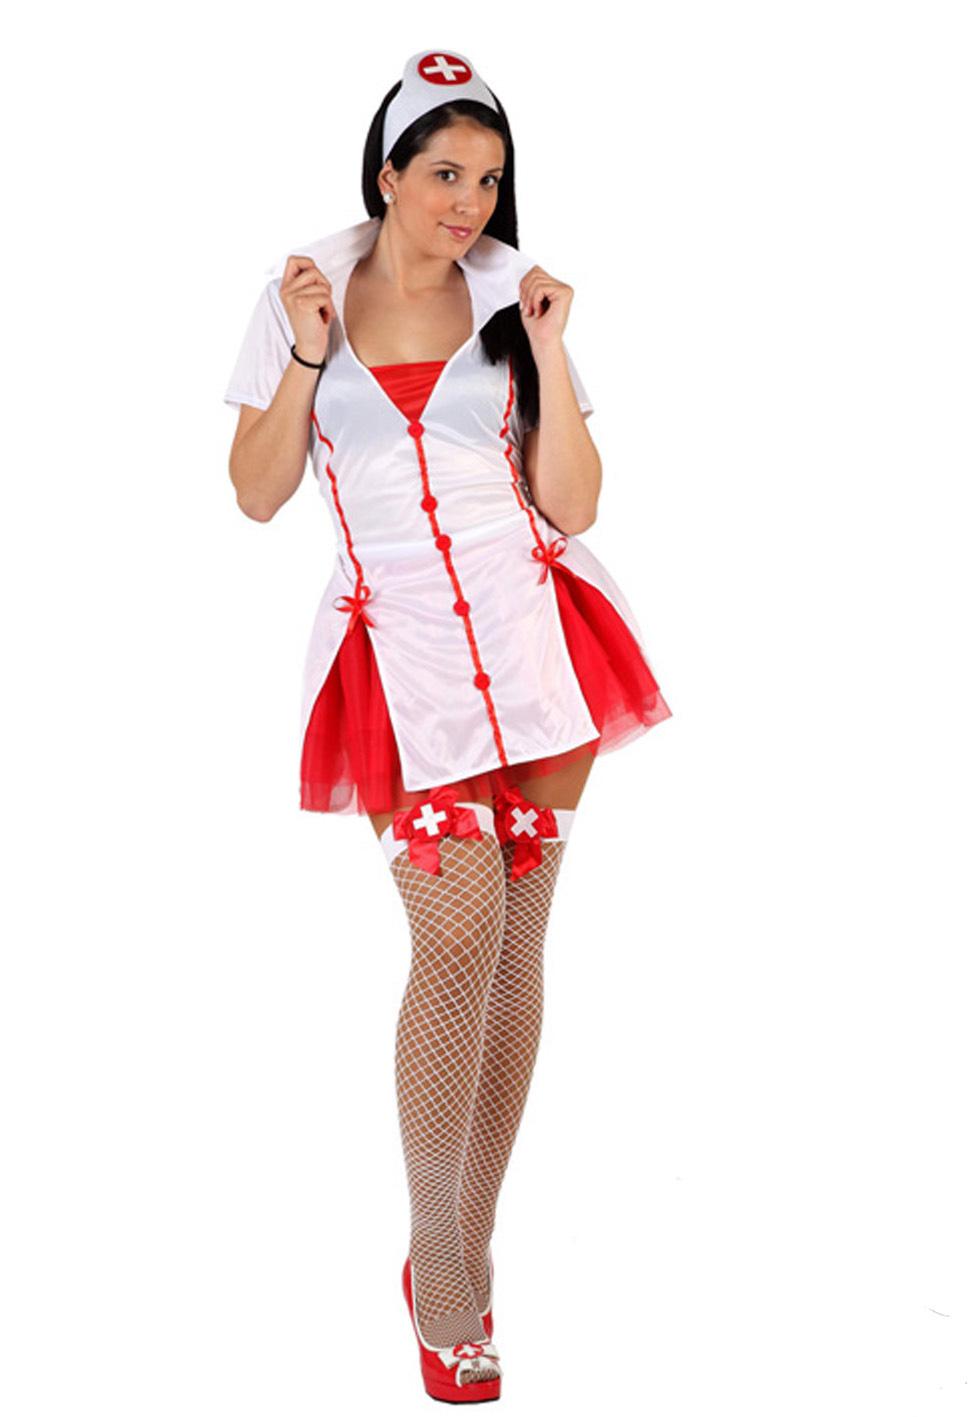 infirmière sexy